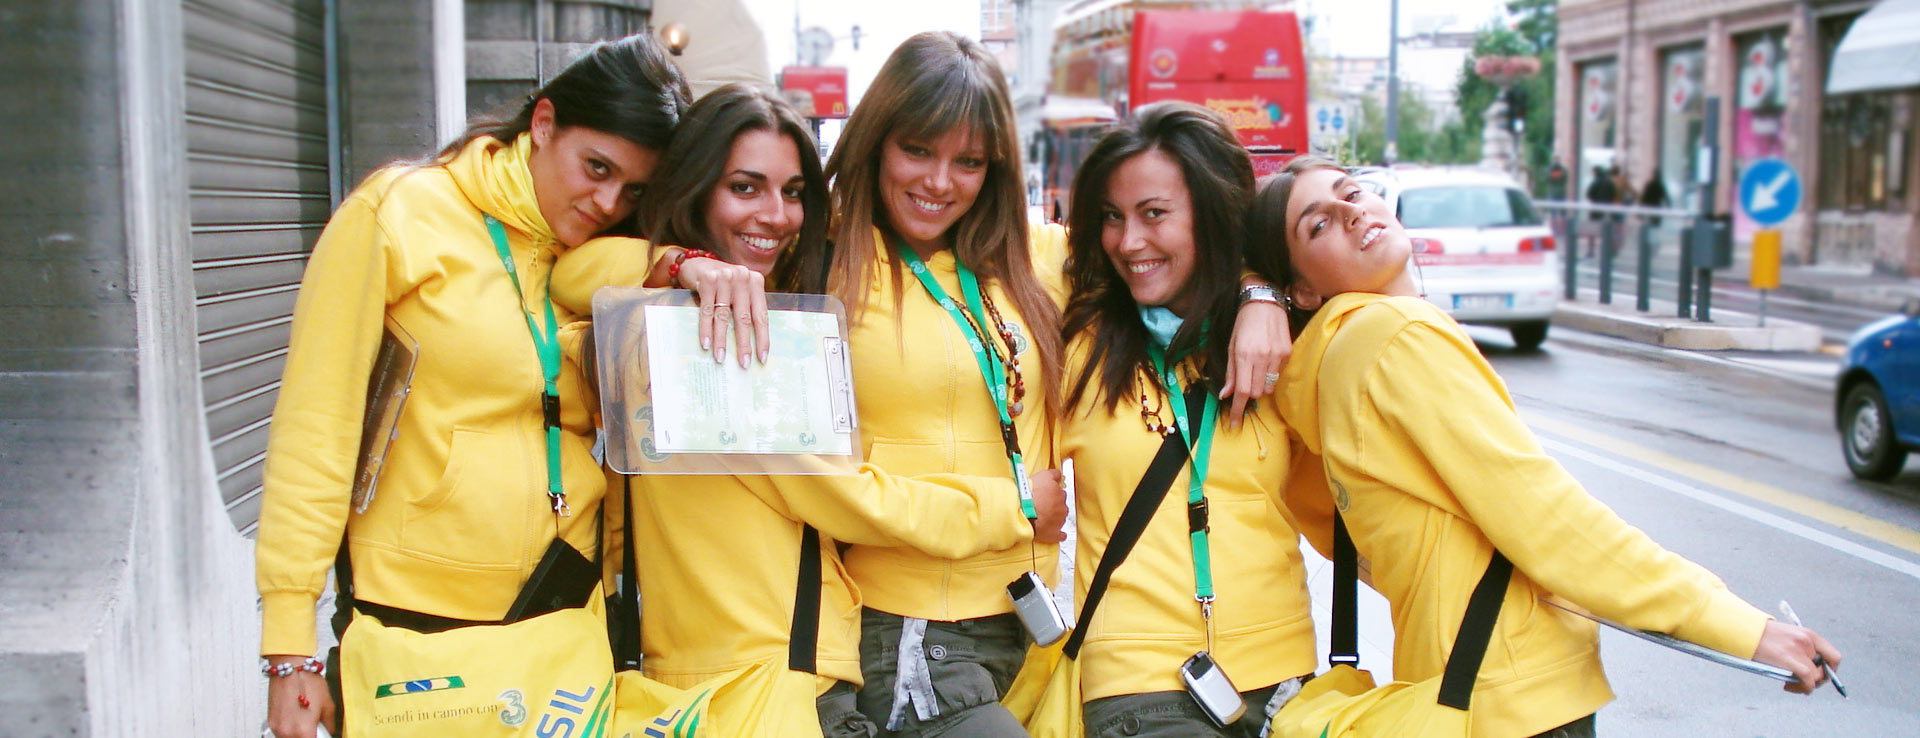 Hostessen, Promoters und andere professionelle Figuren | Hostess ...